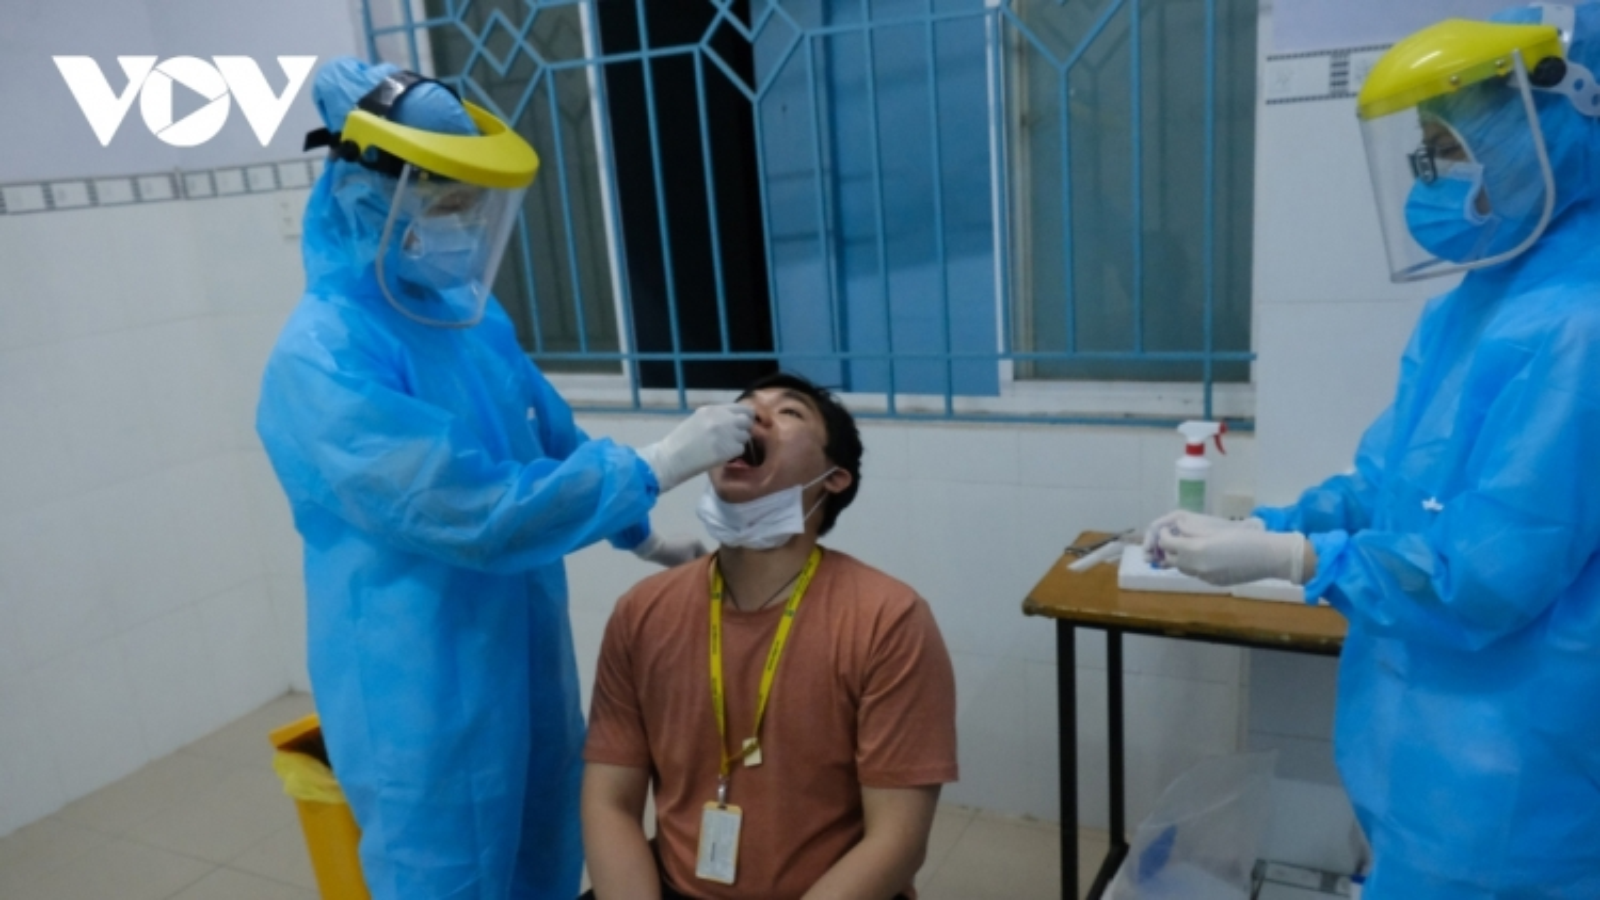 COVID-19: Vietnam confirms three new community cases on Feb. 9 morning